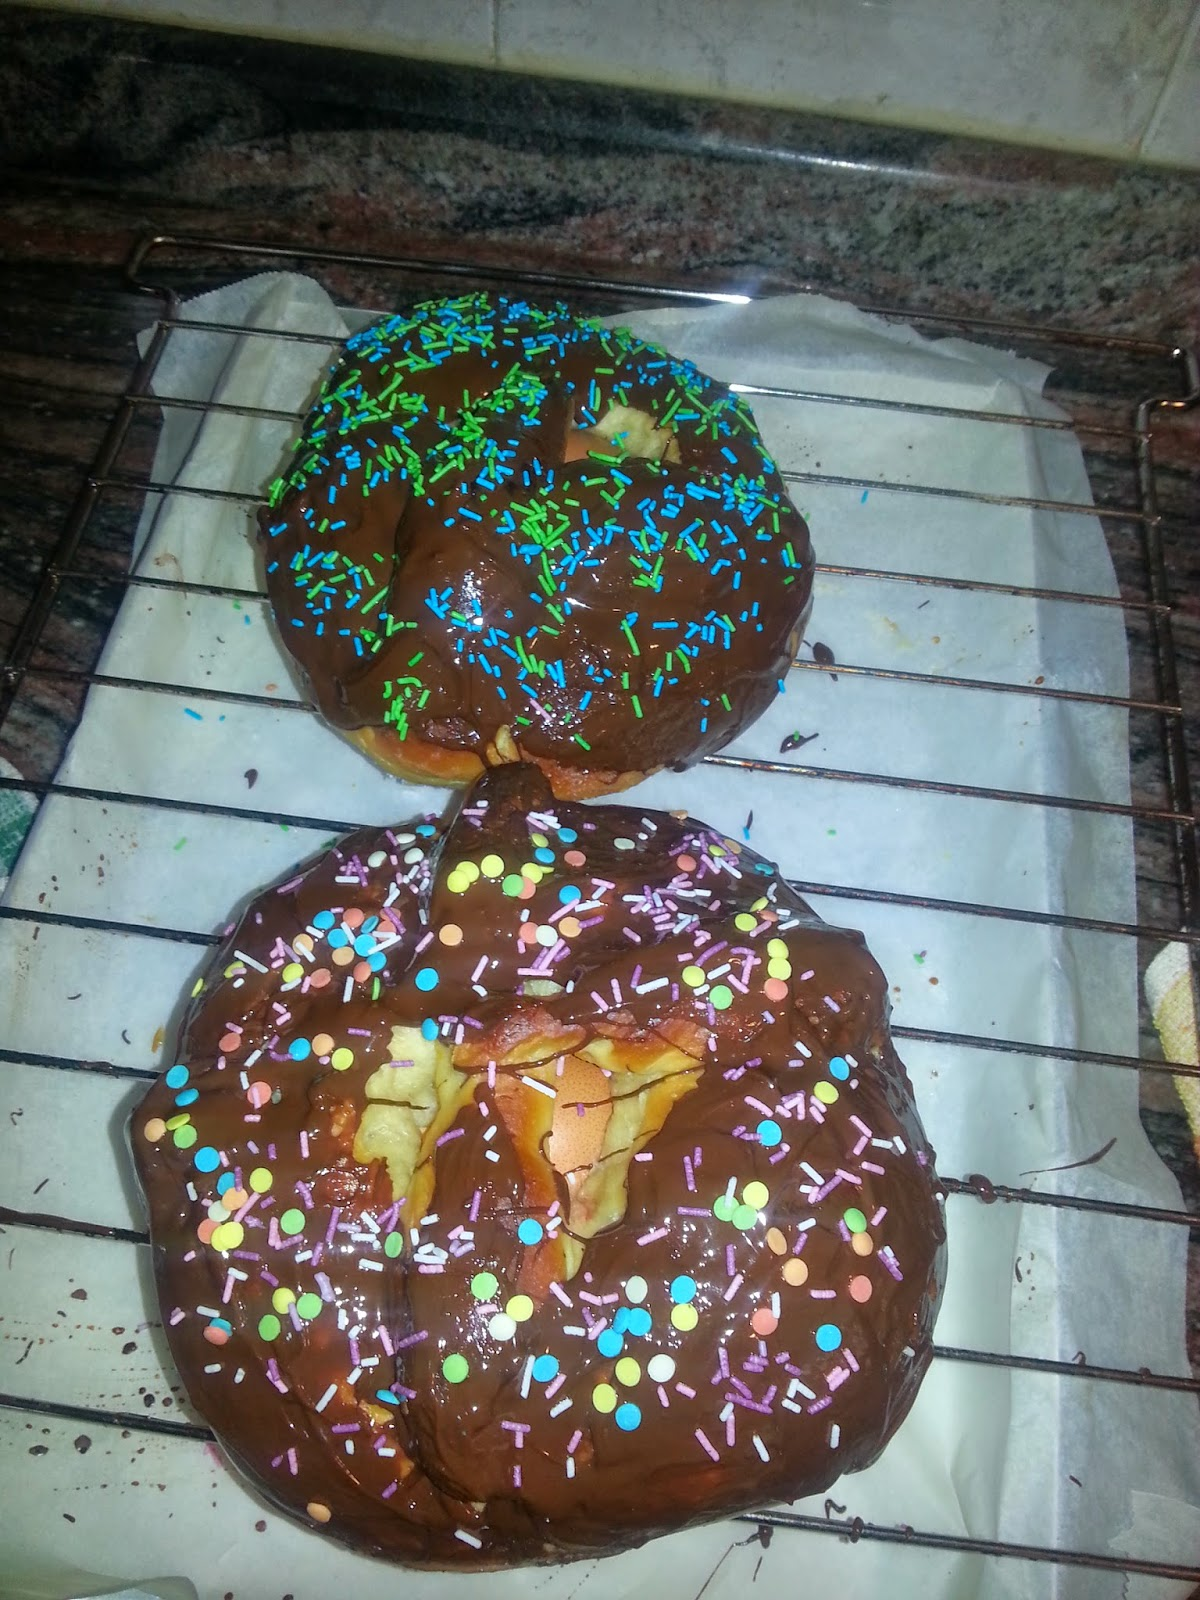 Monas de Pascua chocolateadas recién horneadas